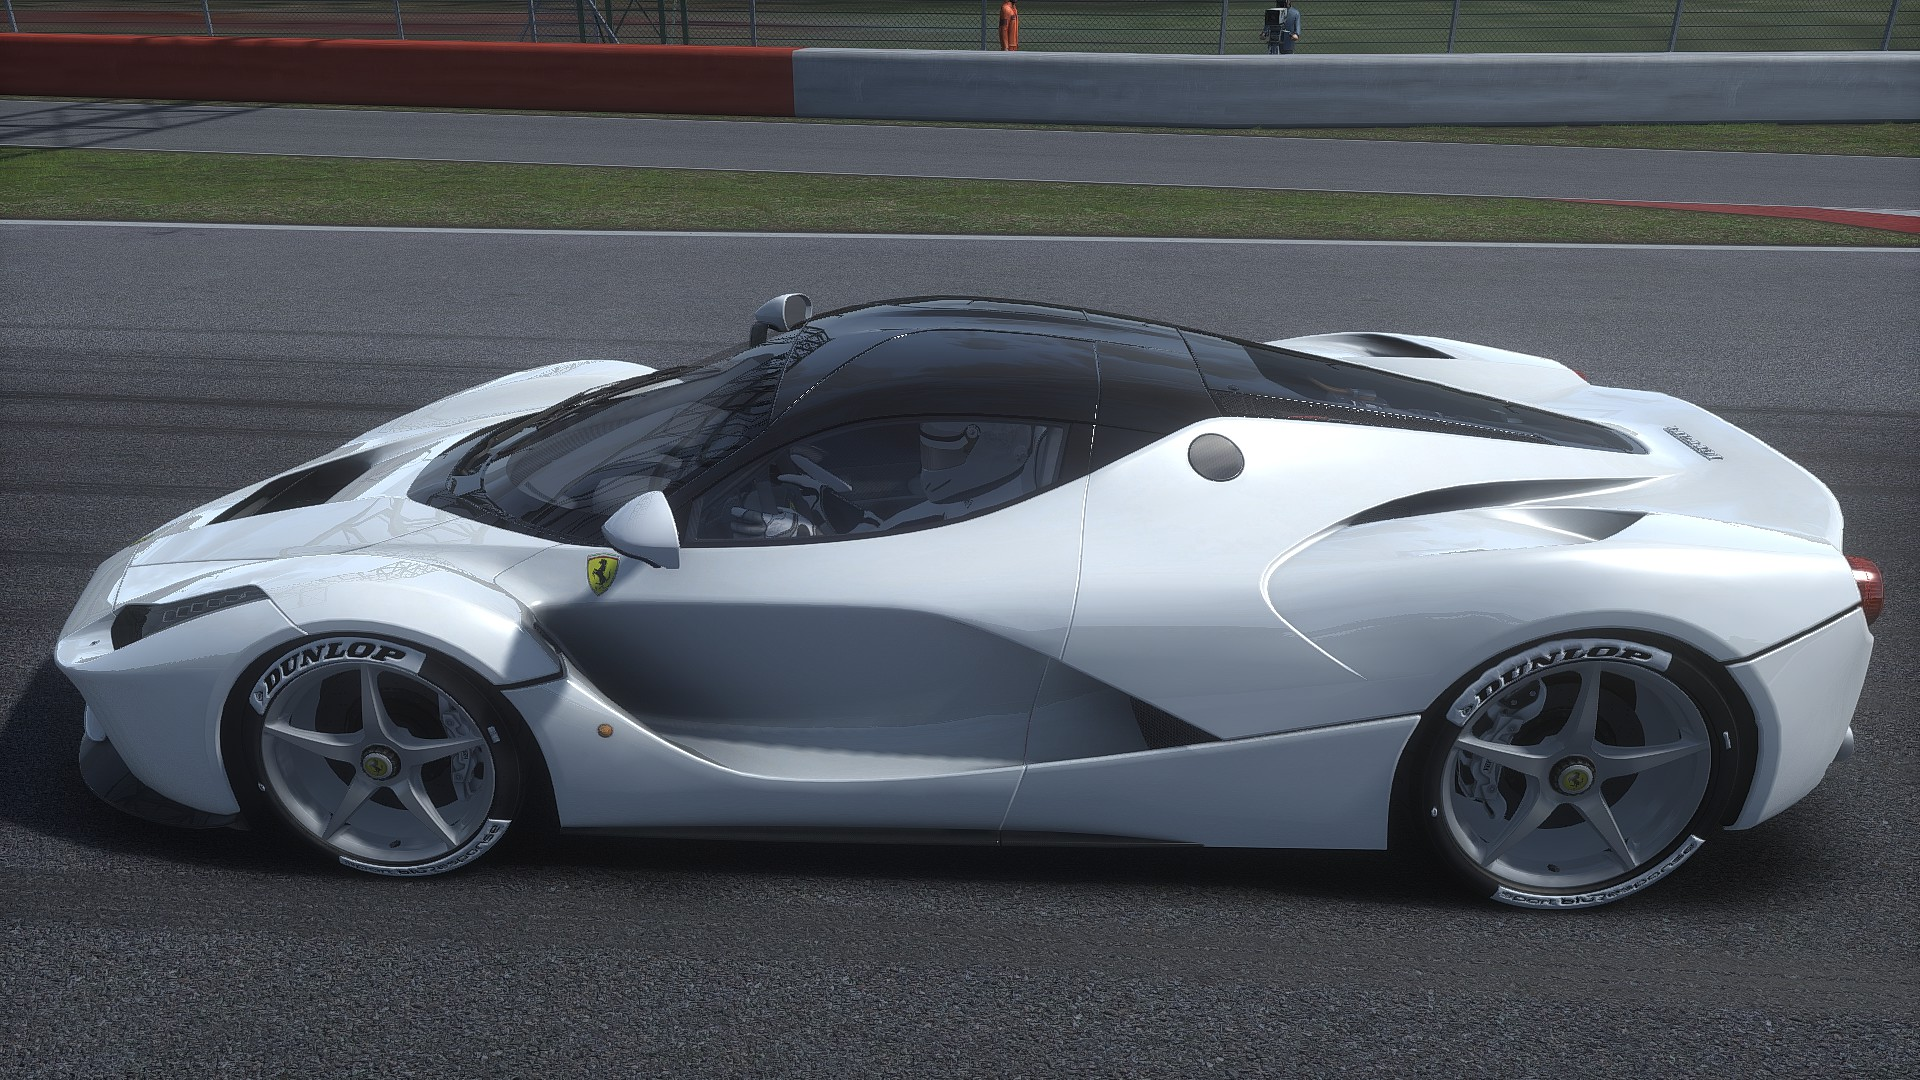 ferrari laferrari white interior. now with matching white leather interior, rims, brake calipers, driver suit. ferrari laferrari interior